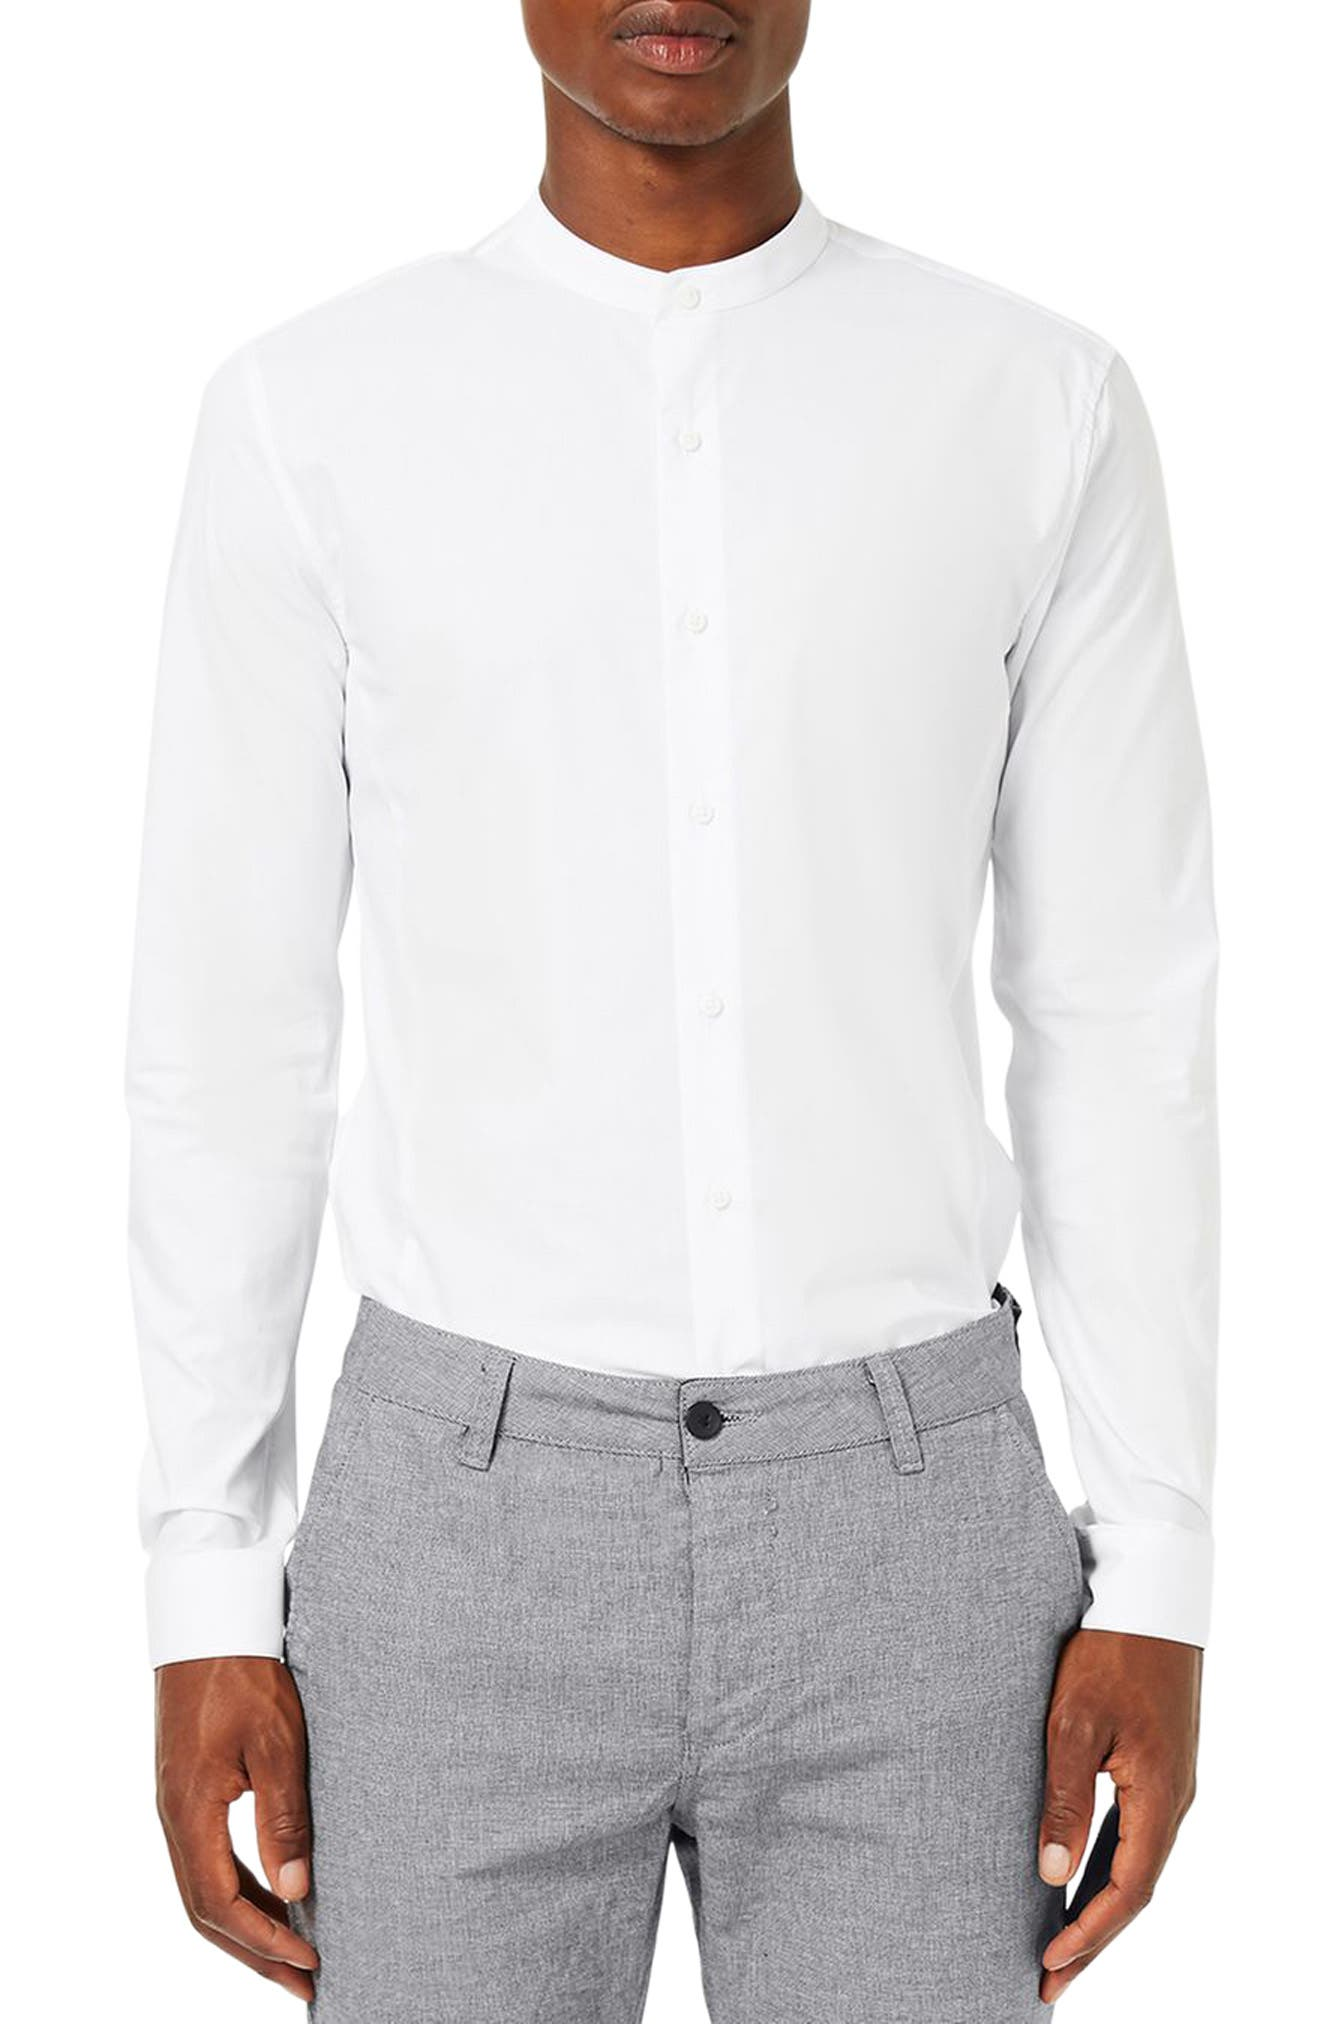 Alternate Image 2  - Topman Band Collar Skinny Fit Dress Shirt